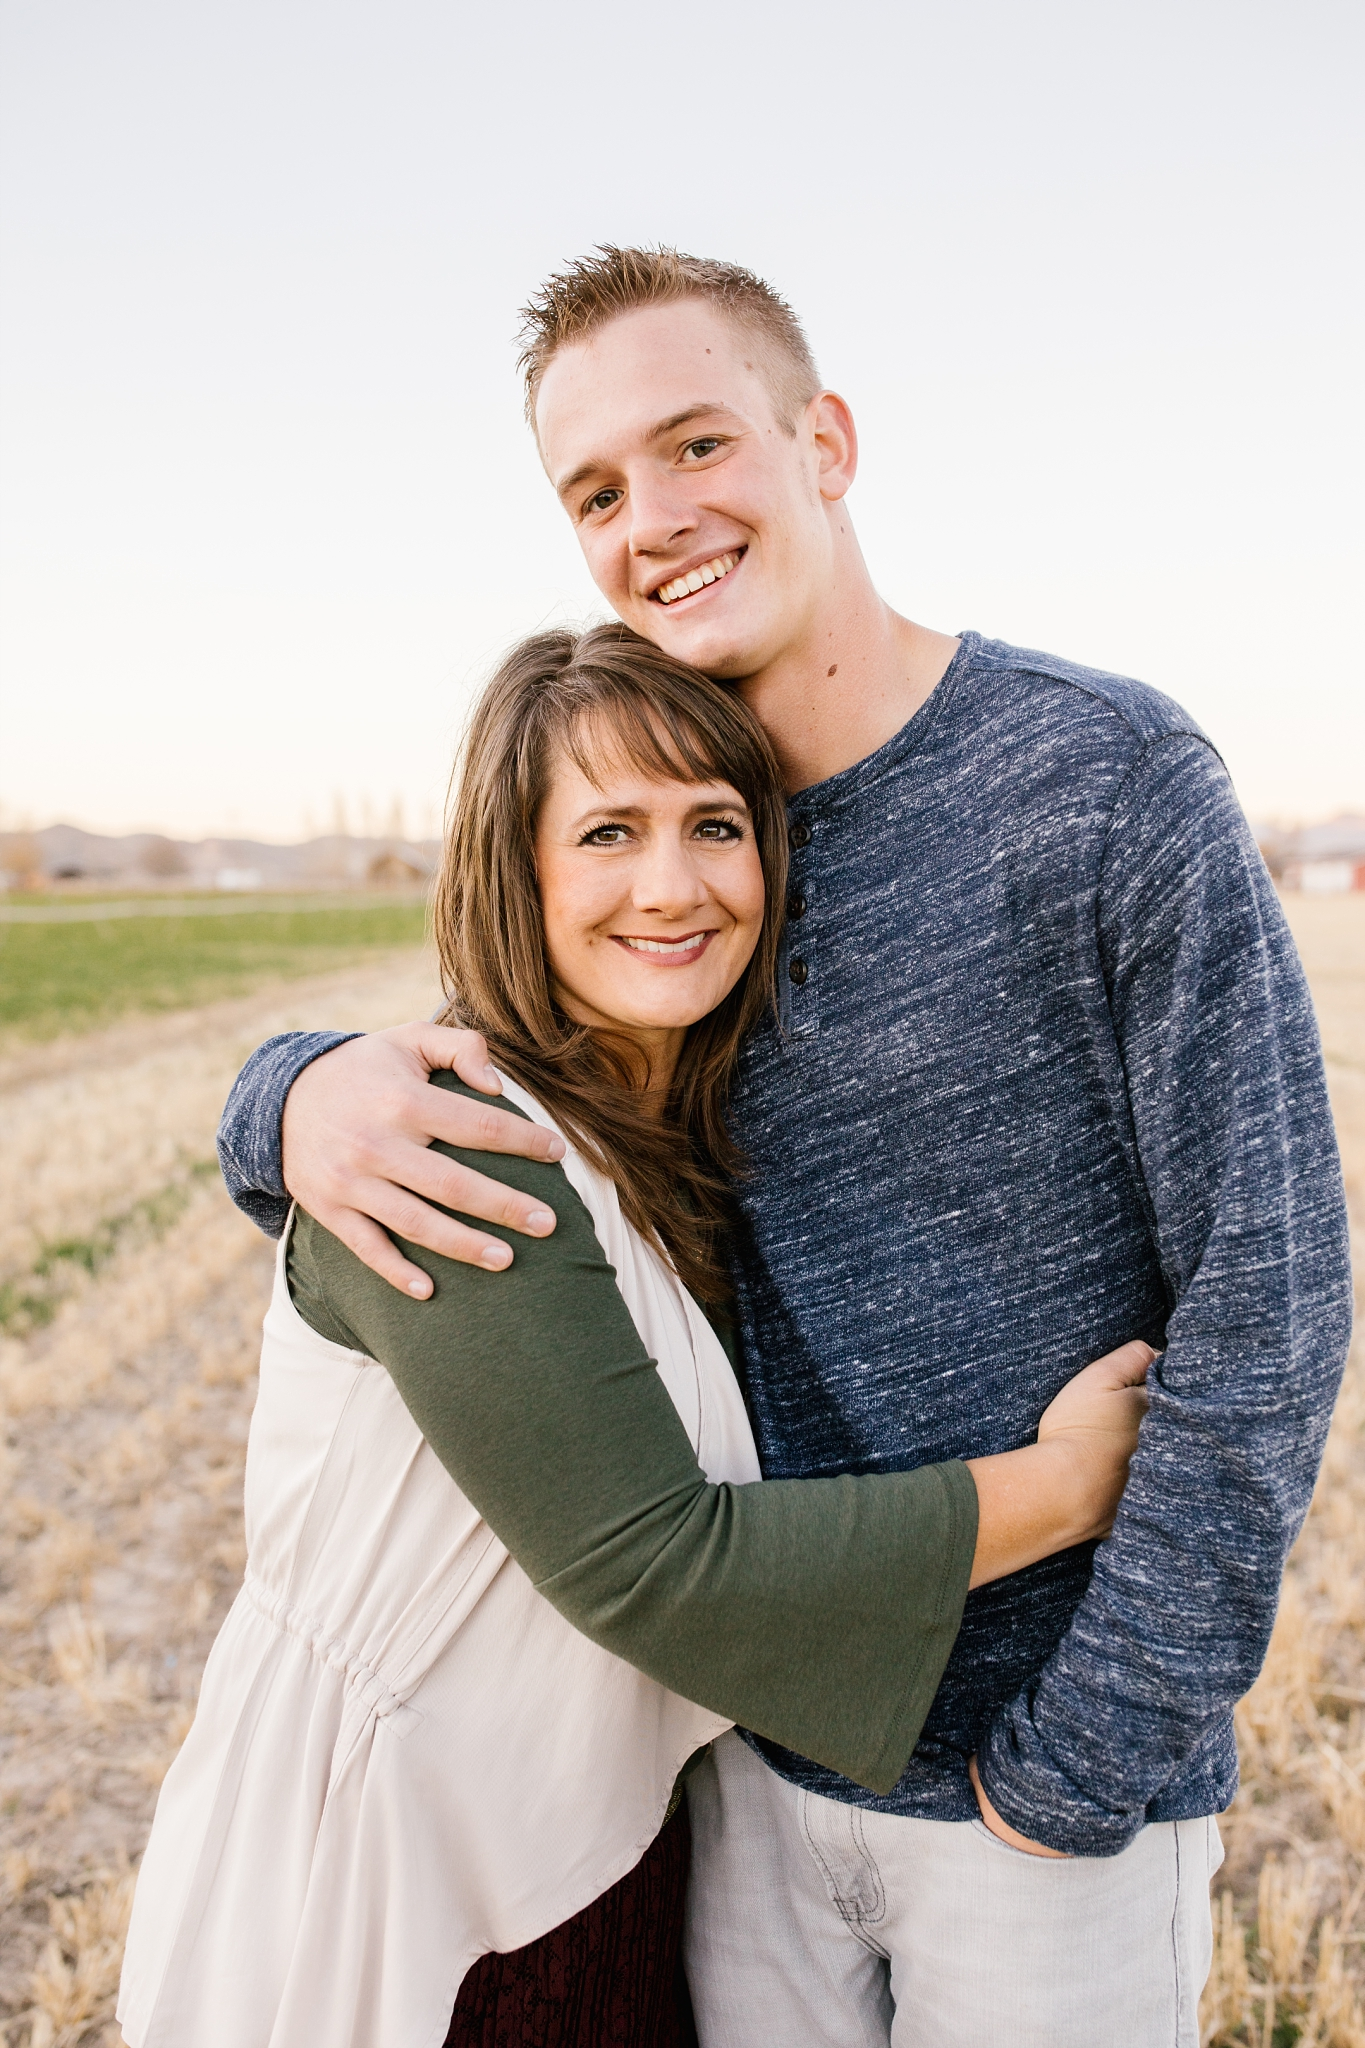 Mickelsen-80_Lizzie-B-Imagery-Utah-Family-Photographer-Lifestyle-Photography-Salt-Lake-City-Park-City-Utah-County.jpg